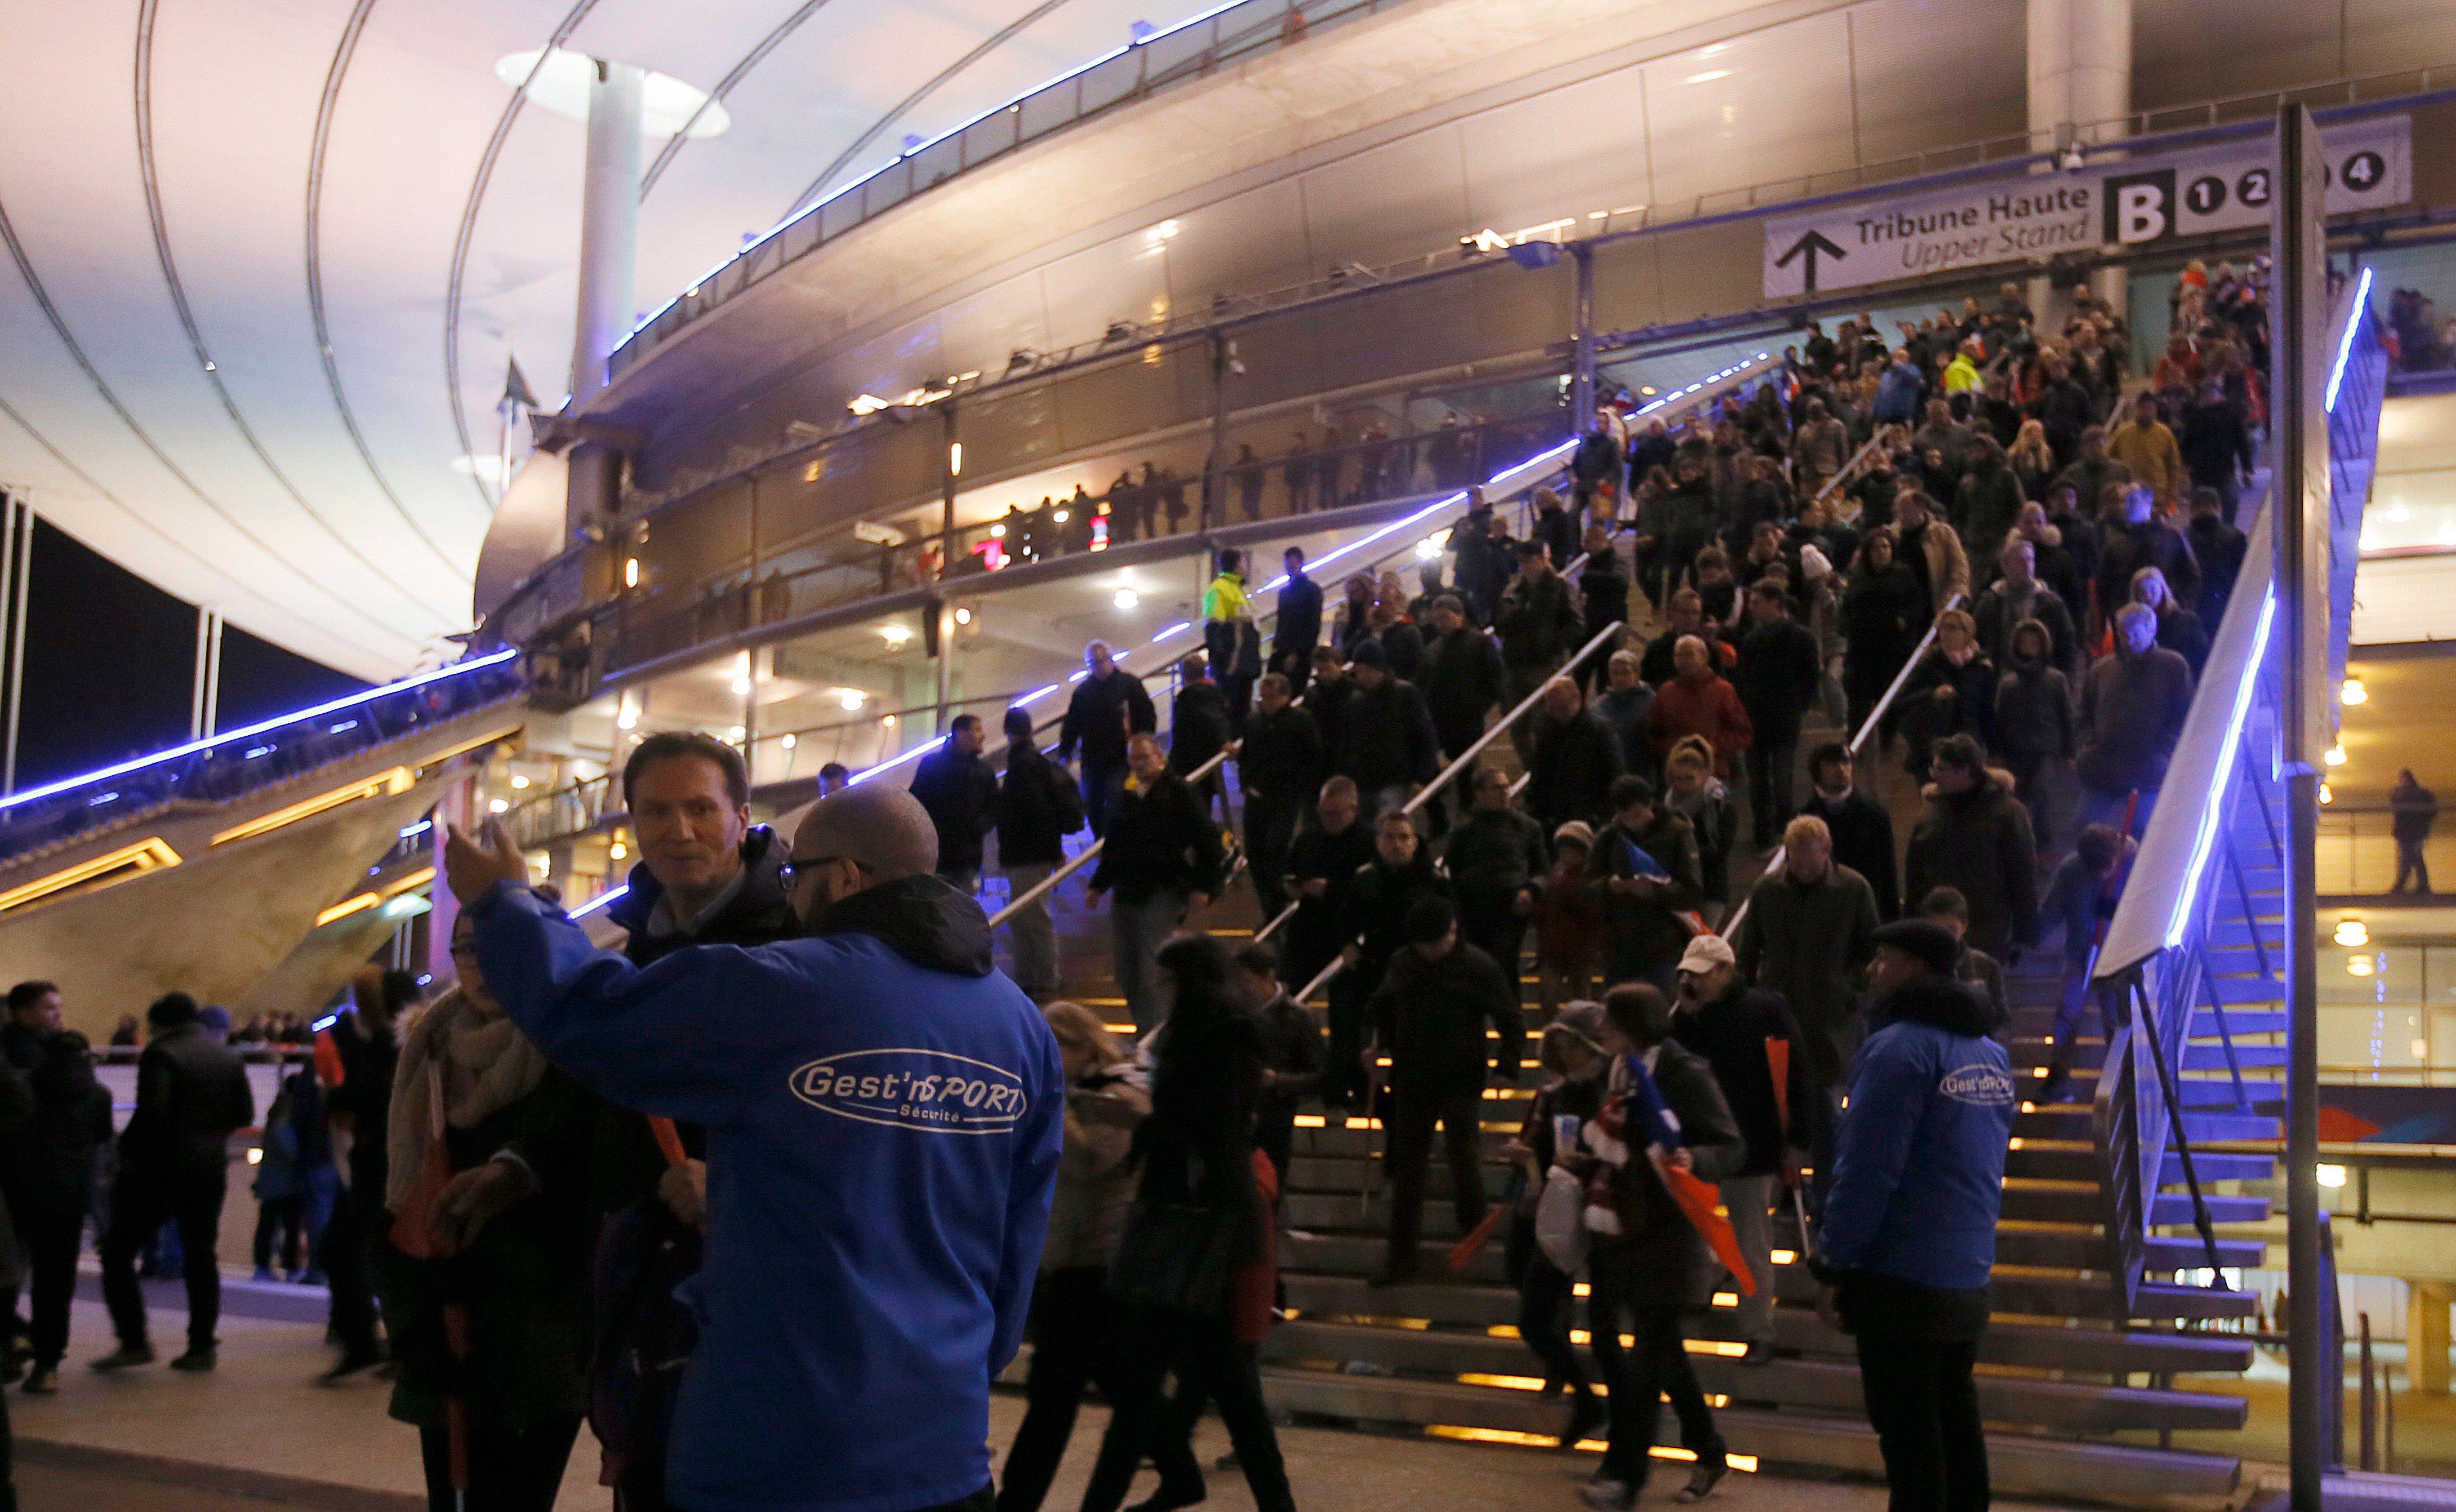 L'évacuation du Stade de France, le 13 novembre.